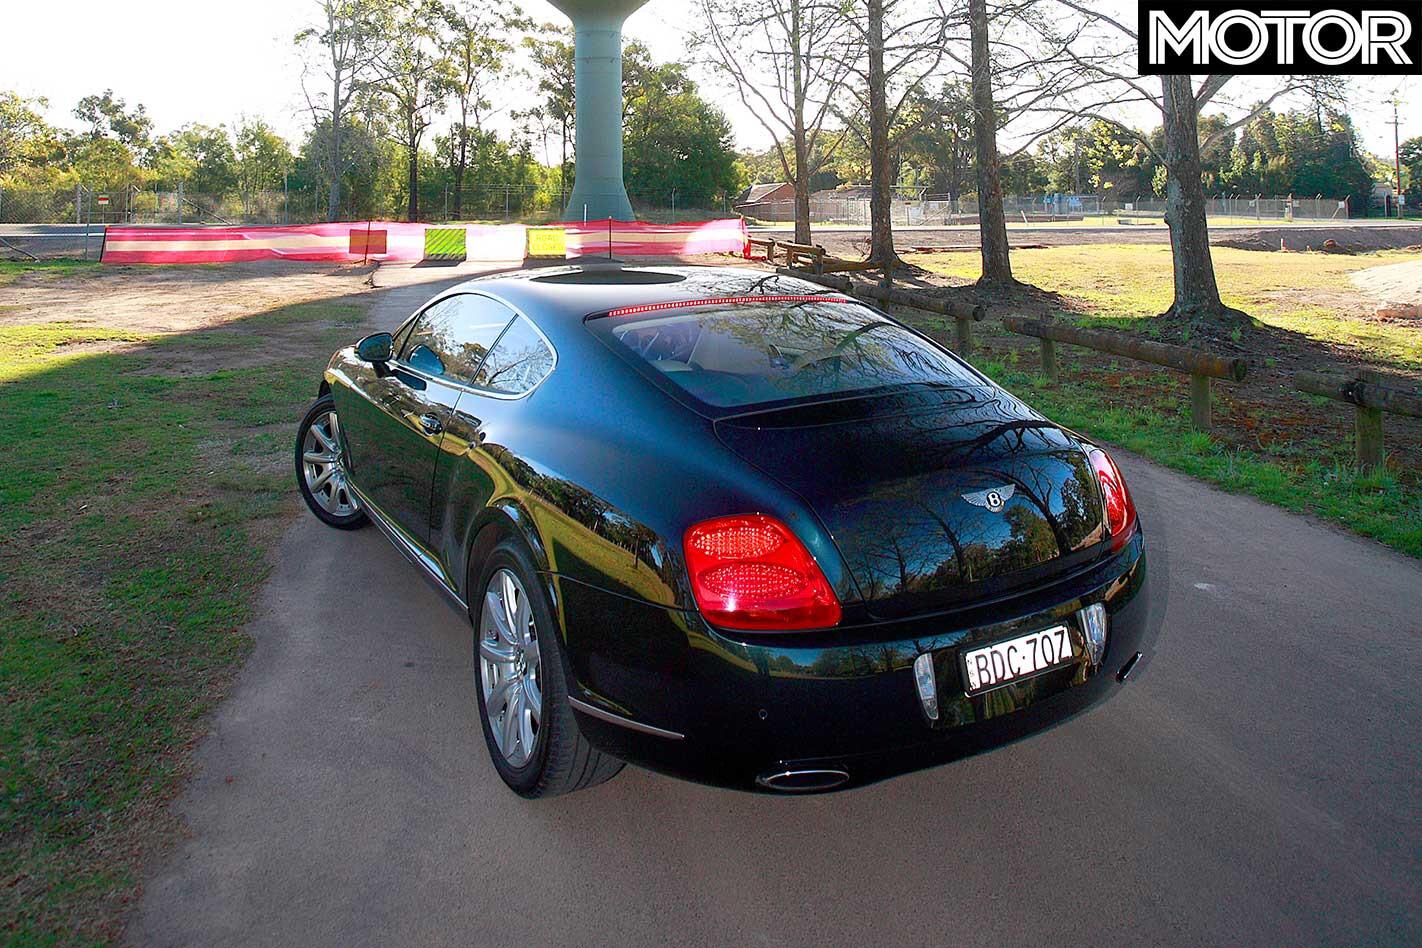 2008 Bentley Continental GT Rear Jpg